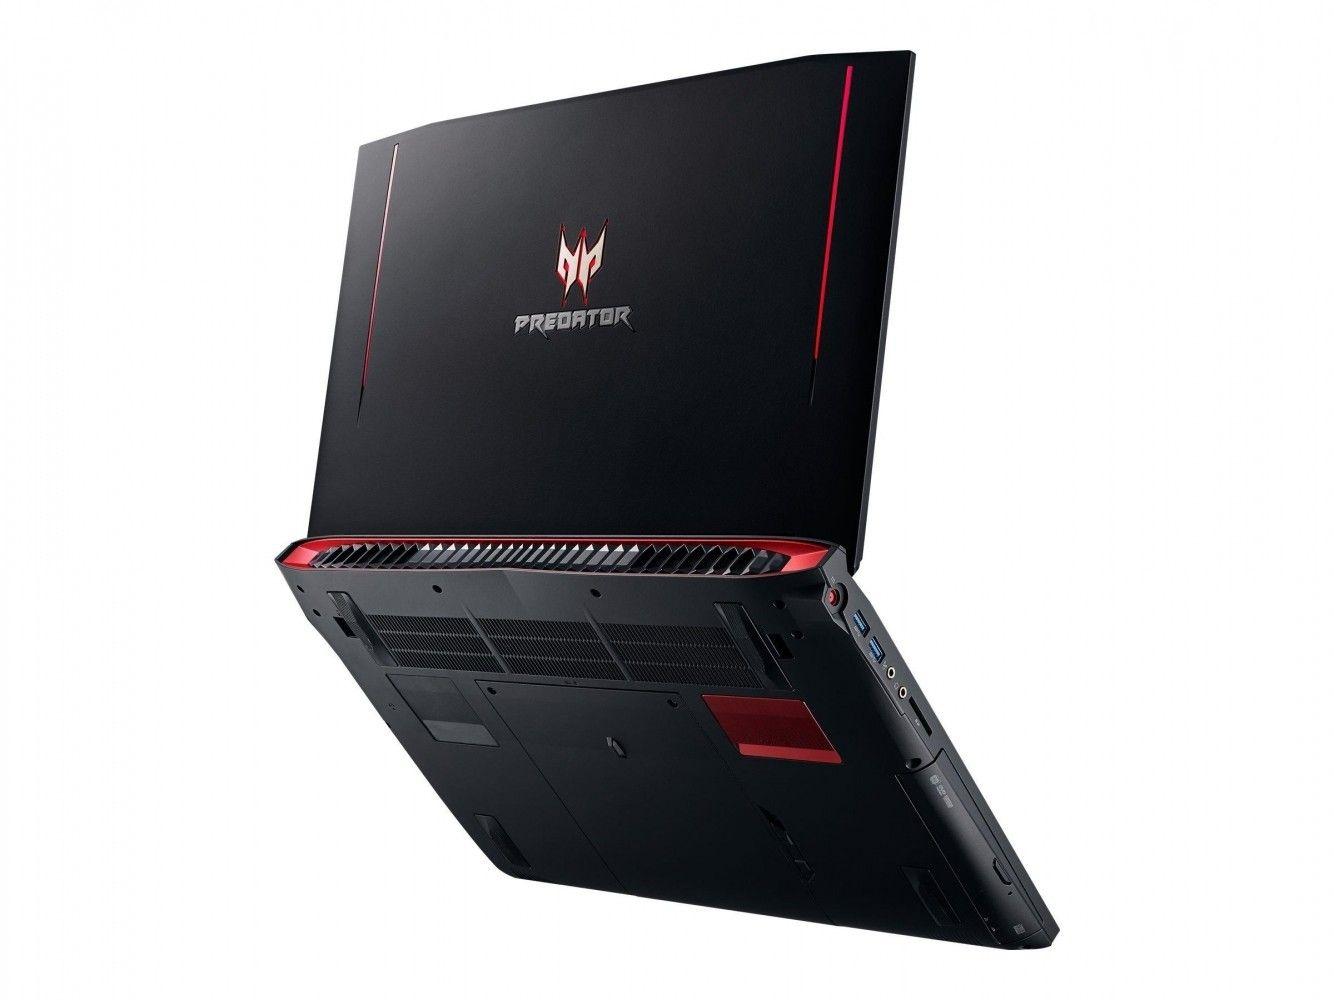 Ноутбук ACER Predator 15 G9-591-72AV (NX.Q07EU.012) - 1